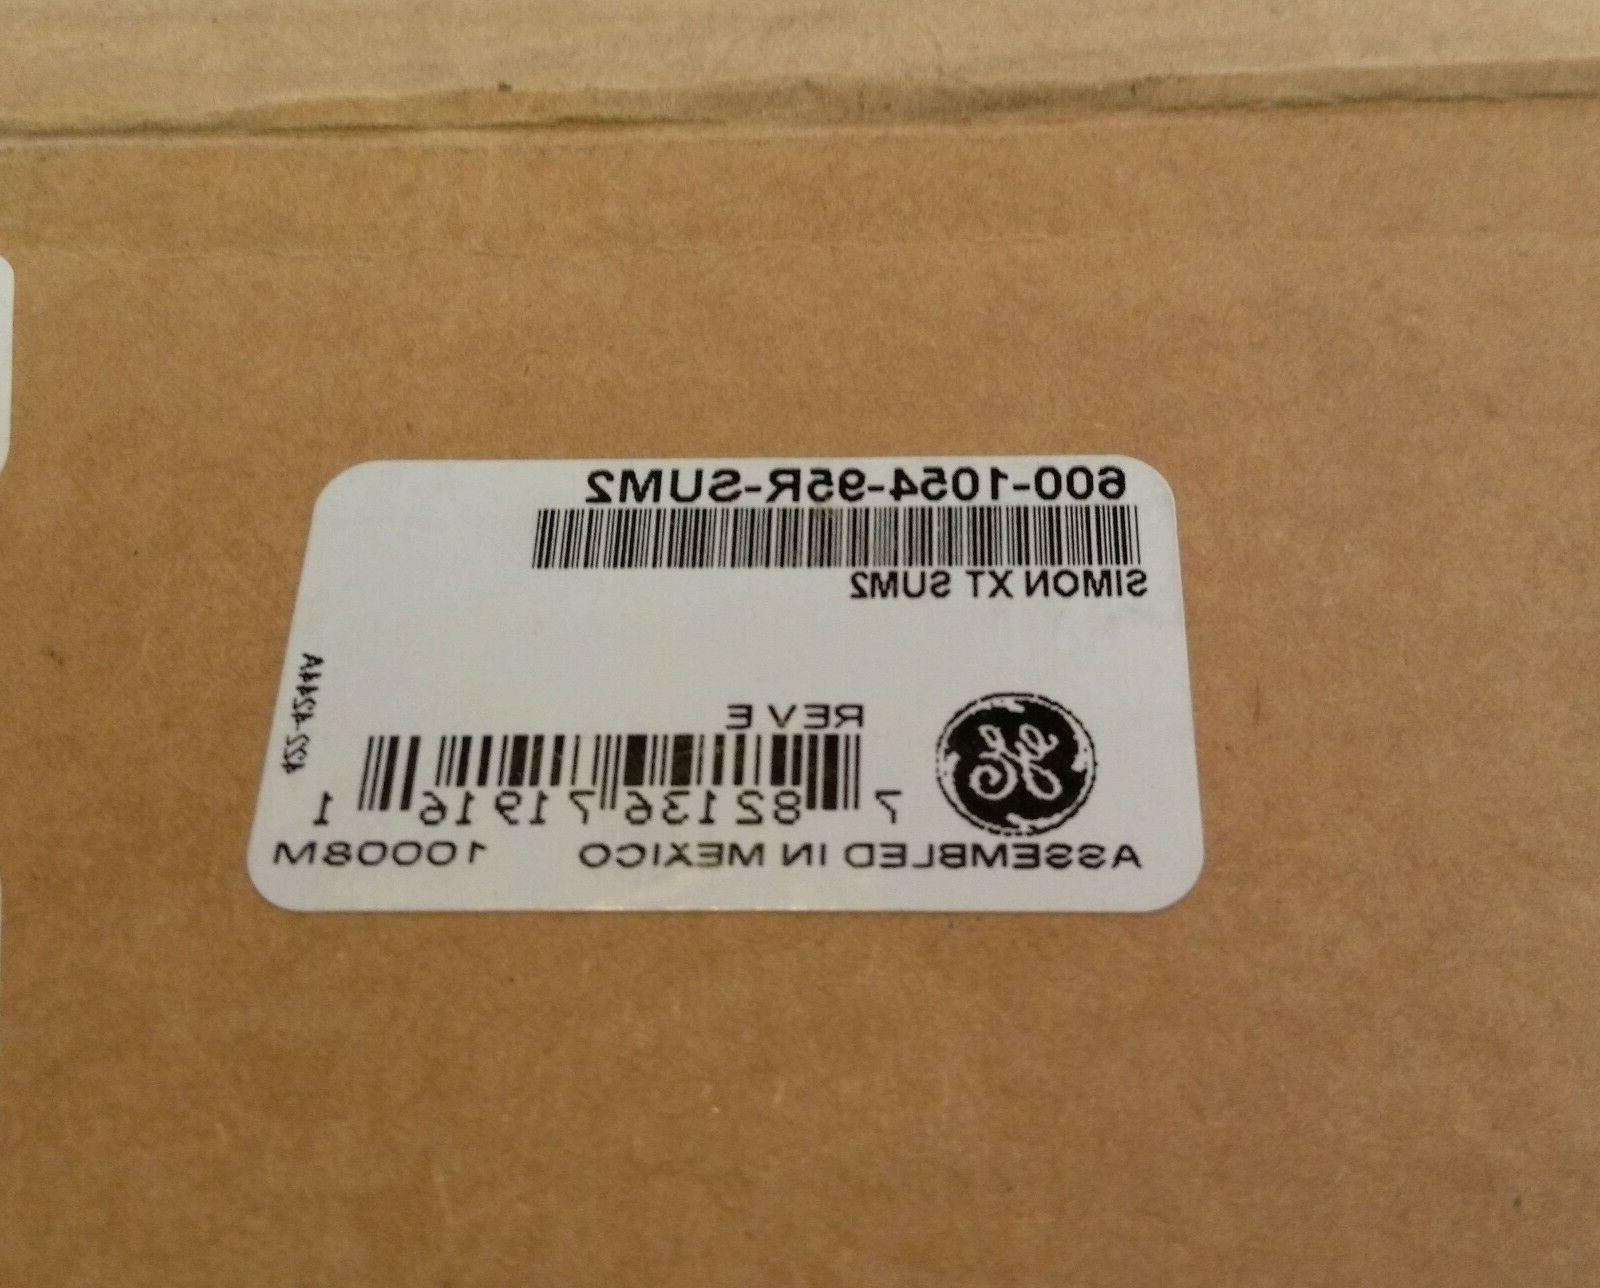 GE SIMON XT 600-1054-95R-SUM2 HOME SECURITY SYSTEM